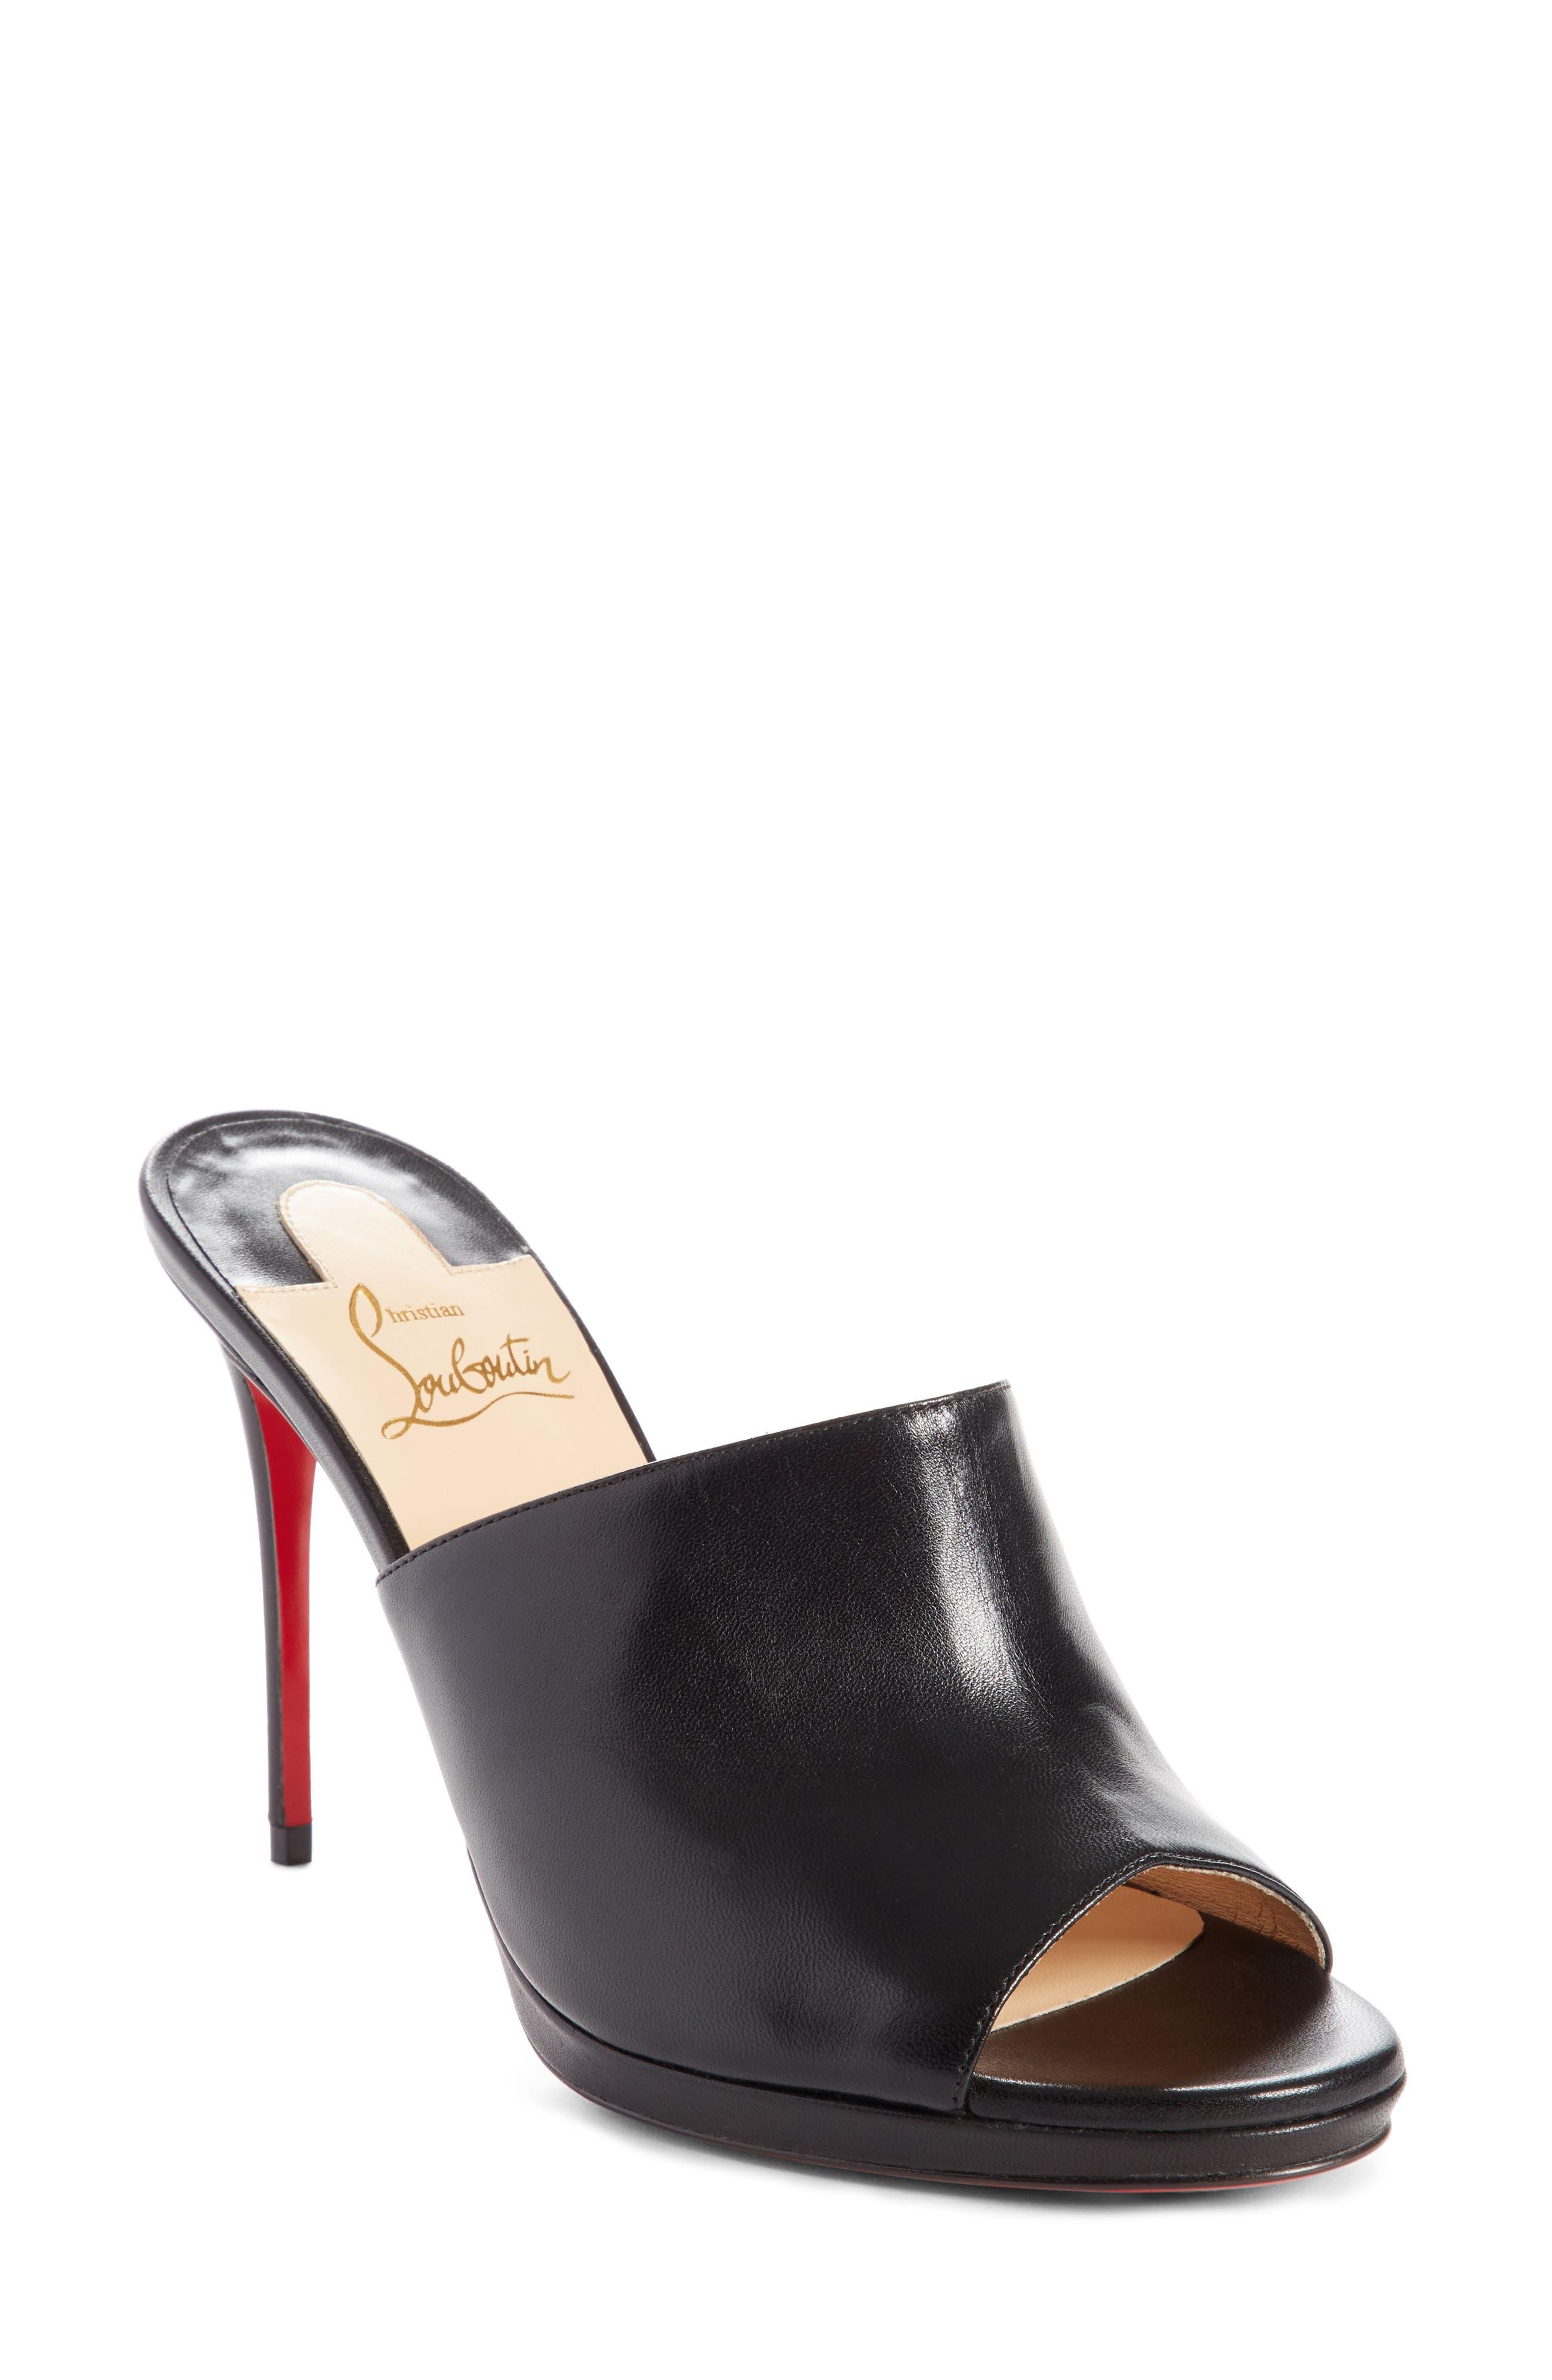 CHRISTIAN LOUBOUTIN Pigamule Sandal, Main, color, BLACK